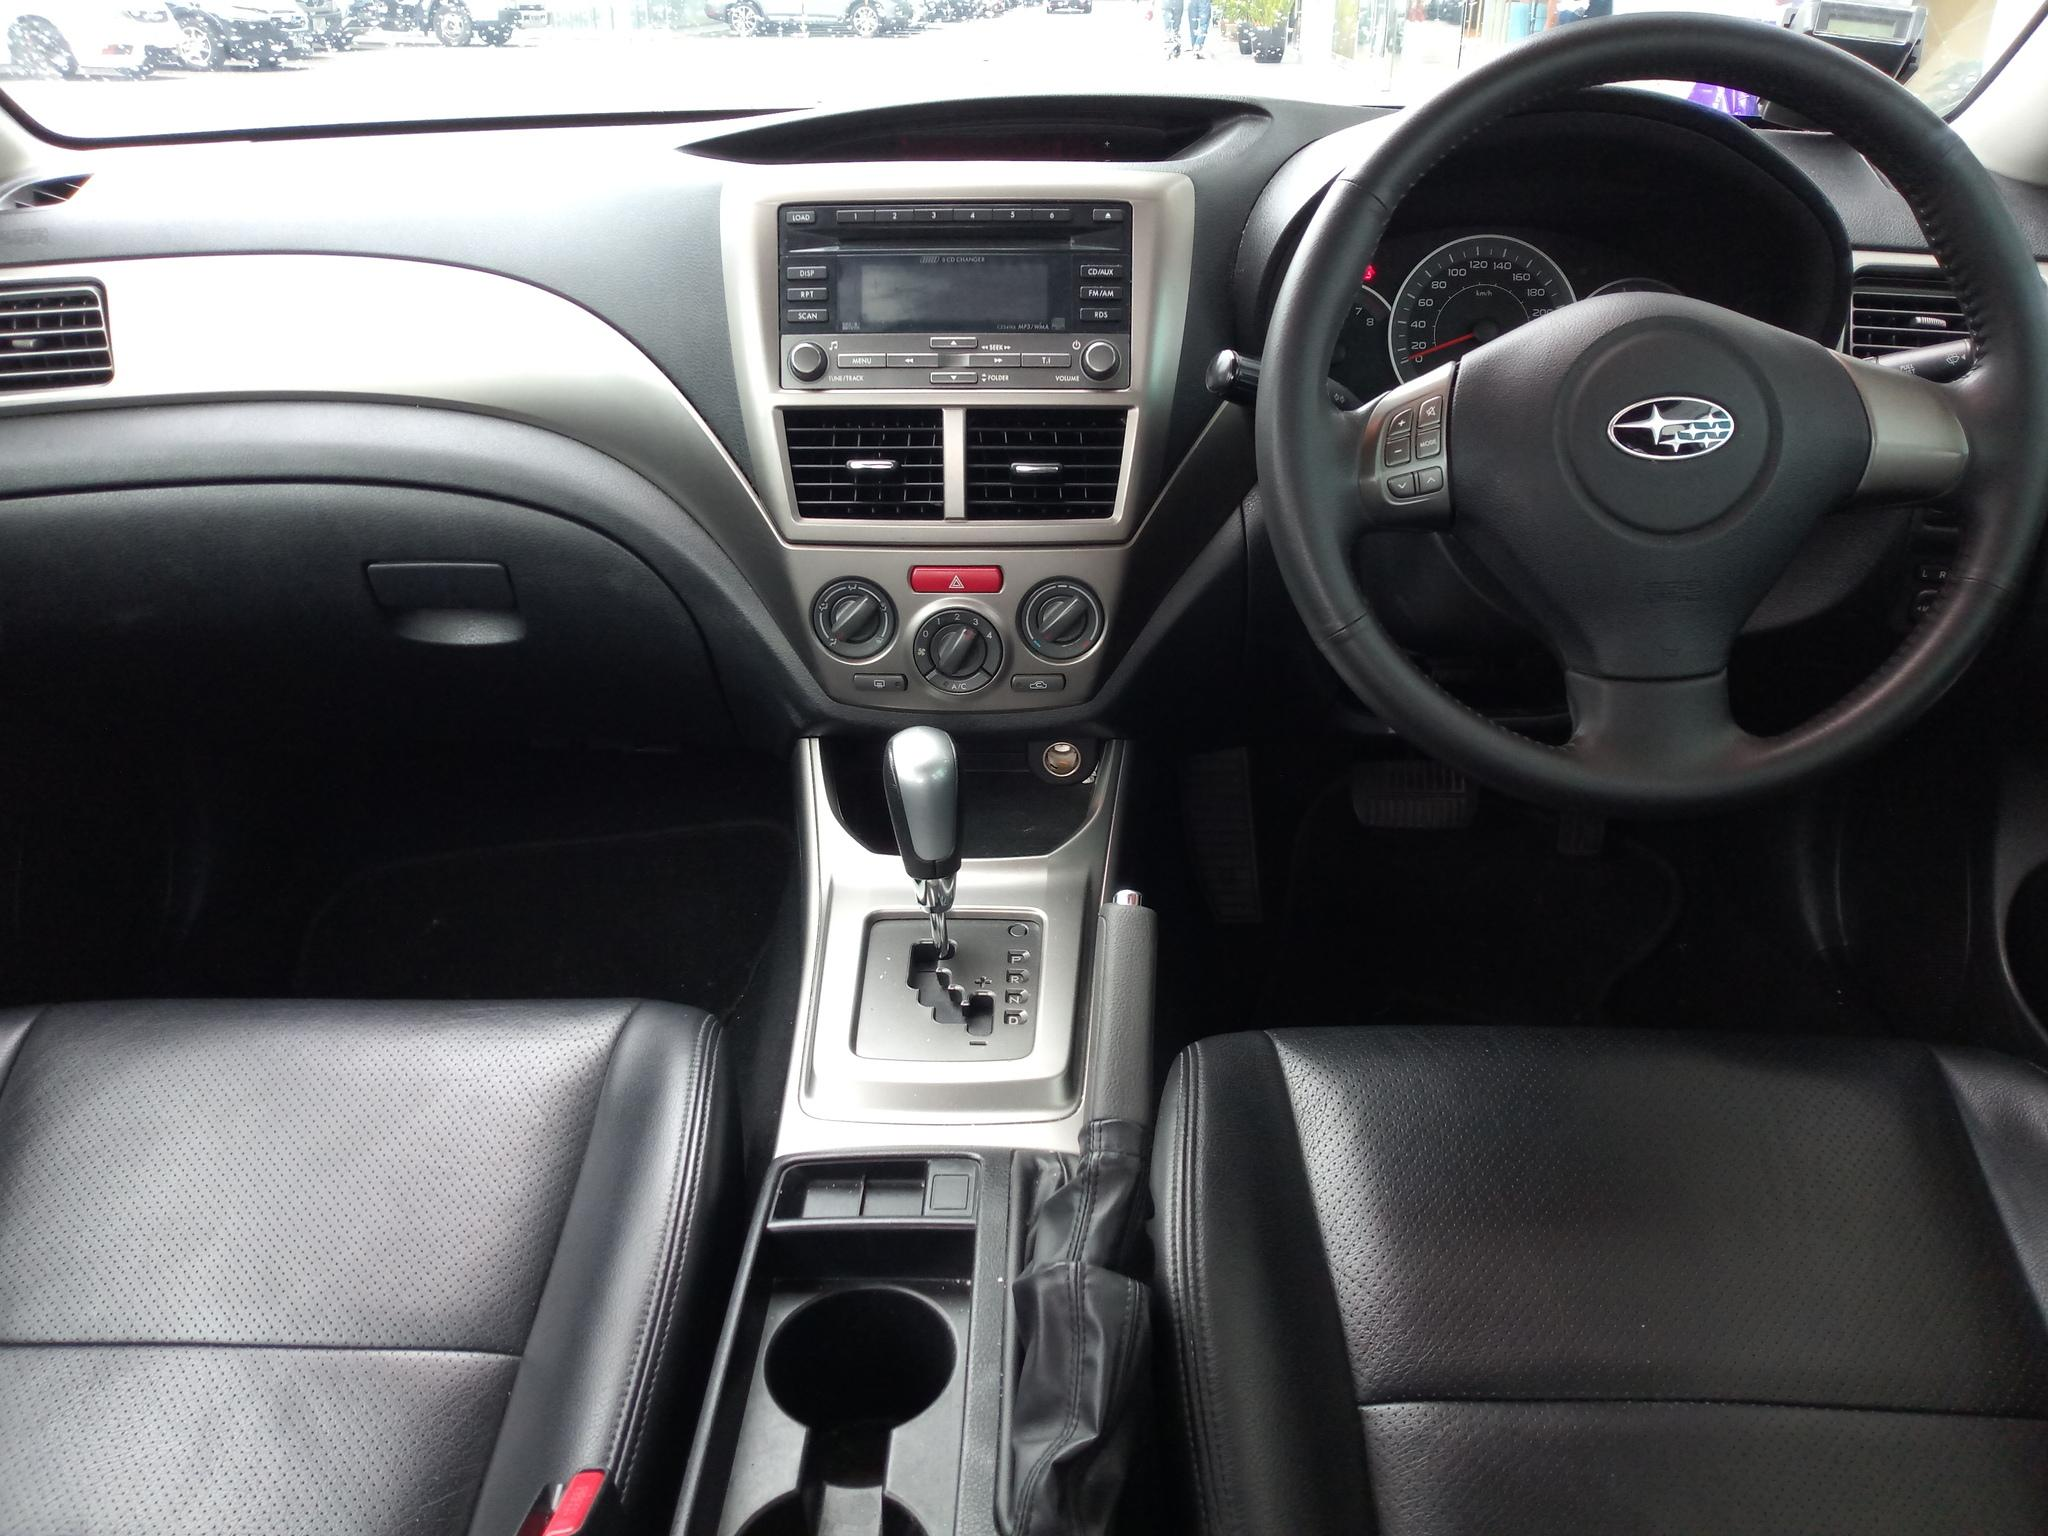 Subaru Impreza 1.5A AWD Cool Car for Personal & PHV Usage